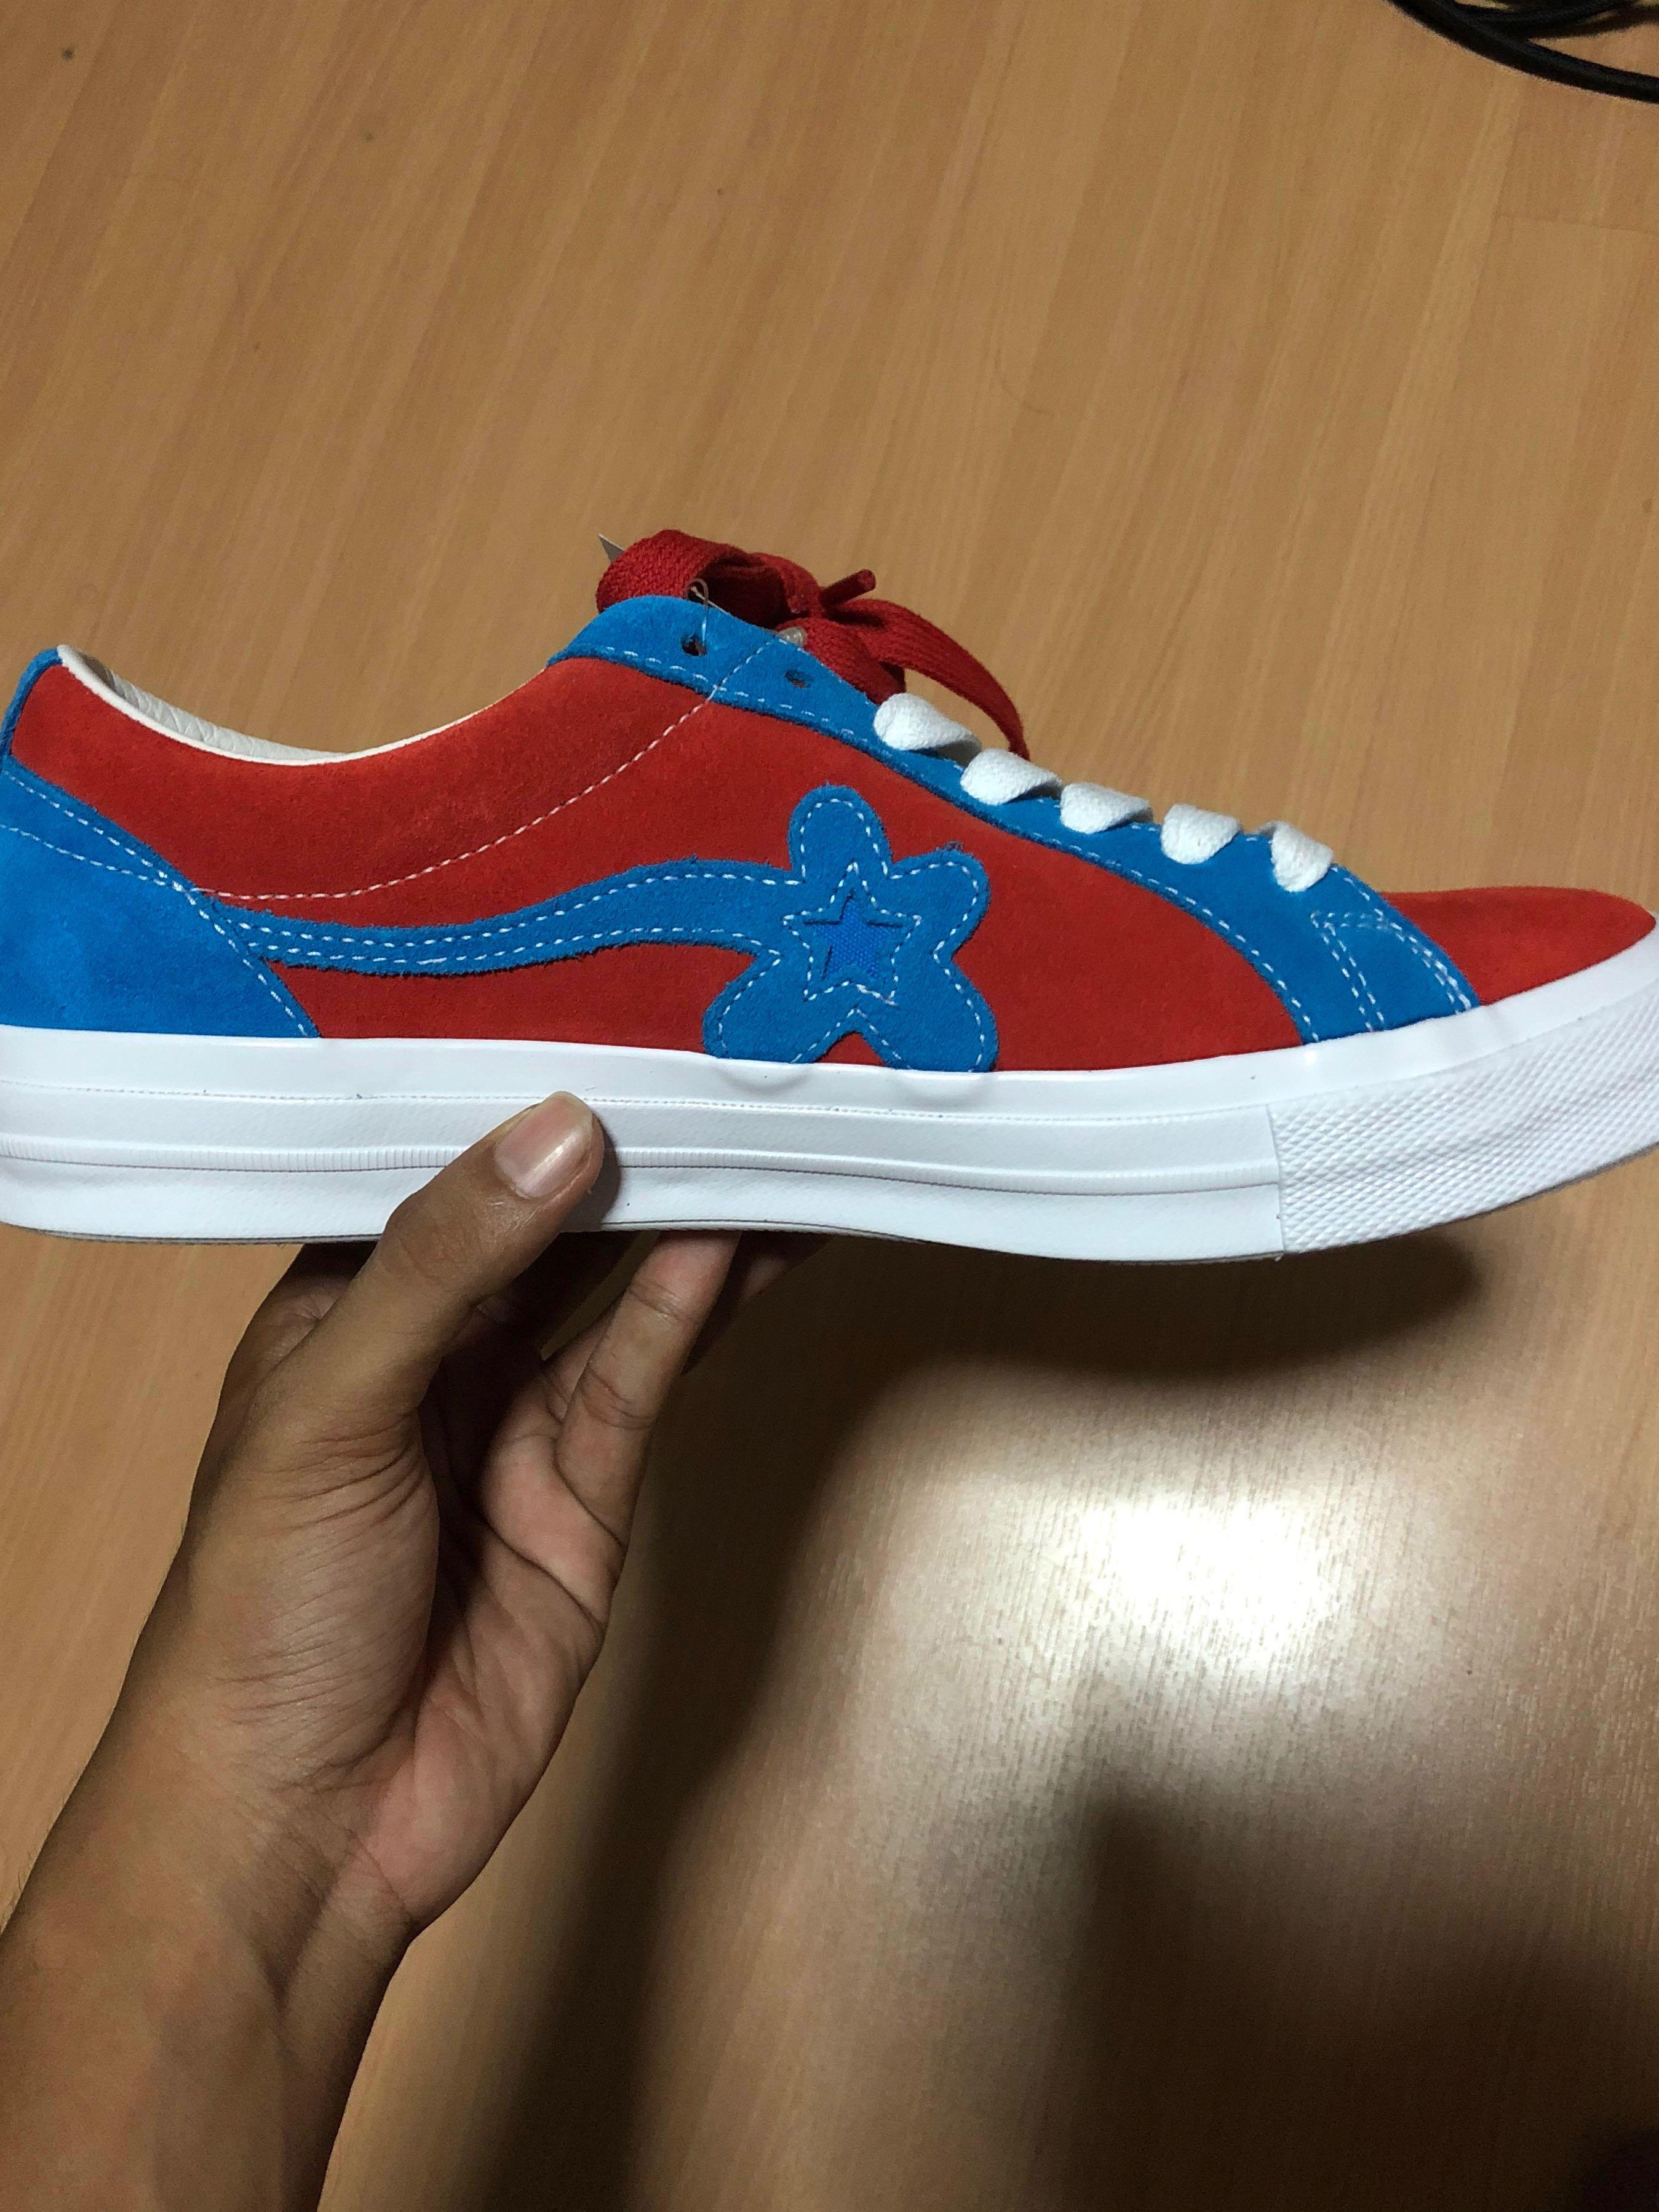 Wtt Converse Golf Le Fleur Red Blue Men S Fashion Footwear